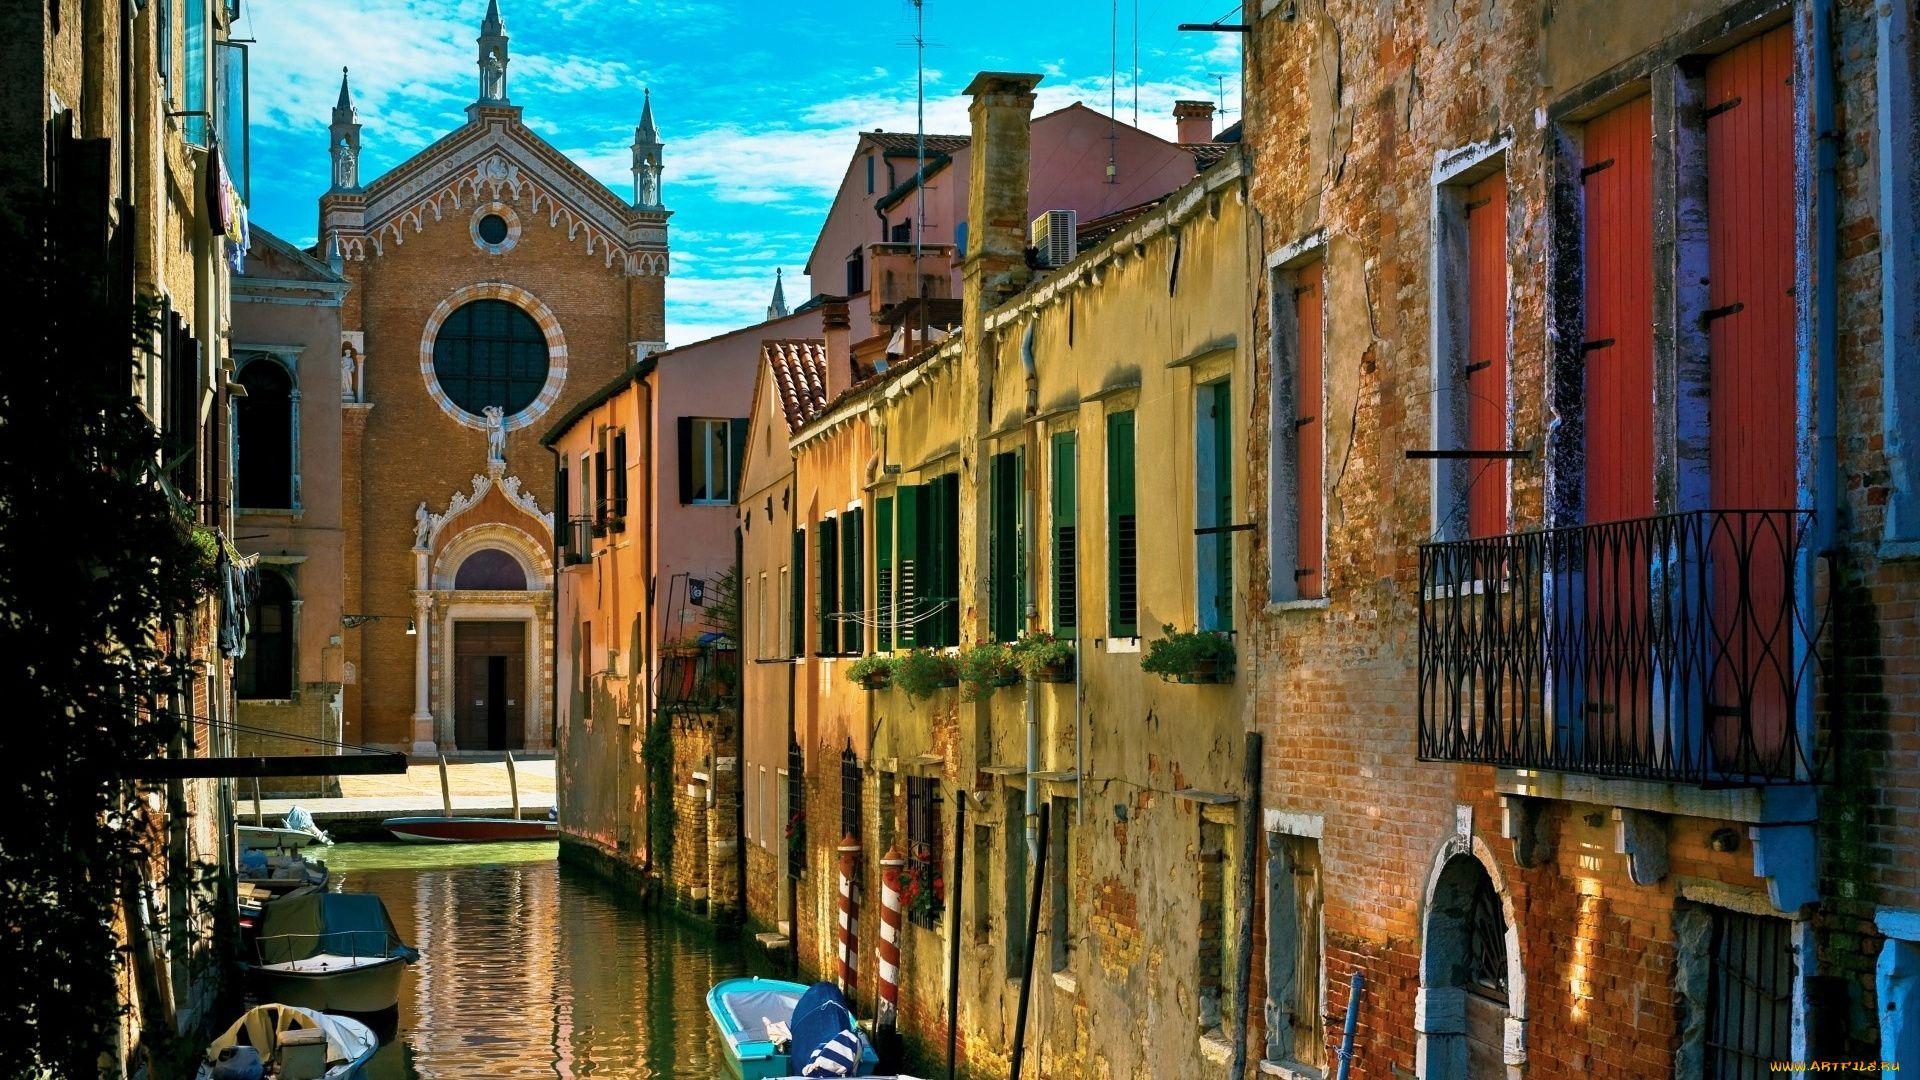 Italy free image